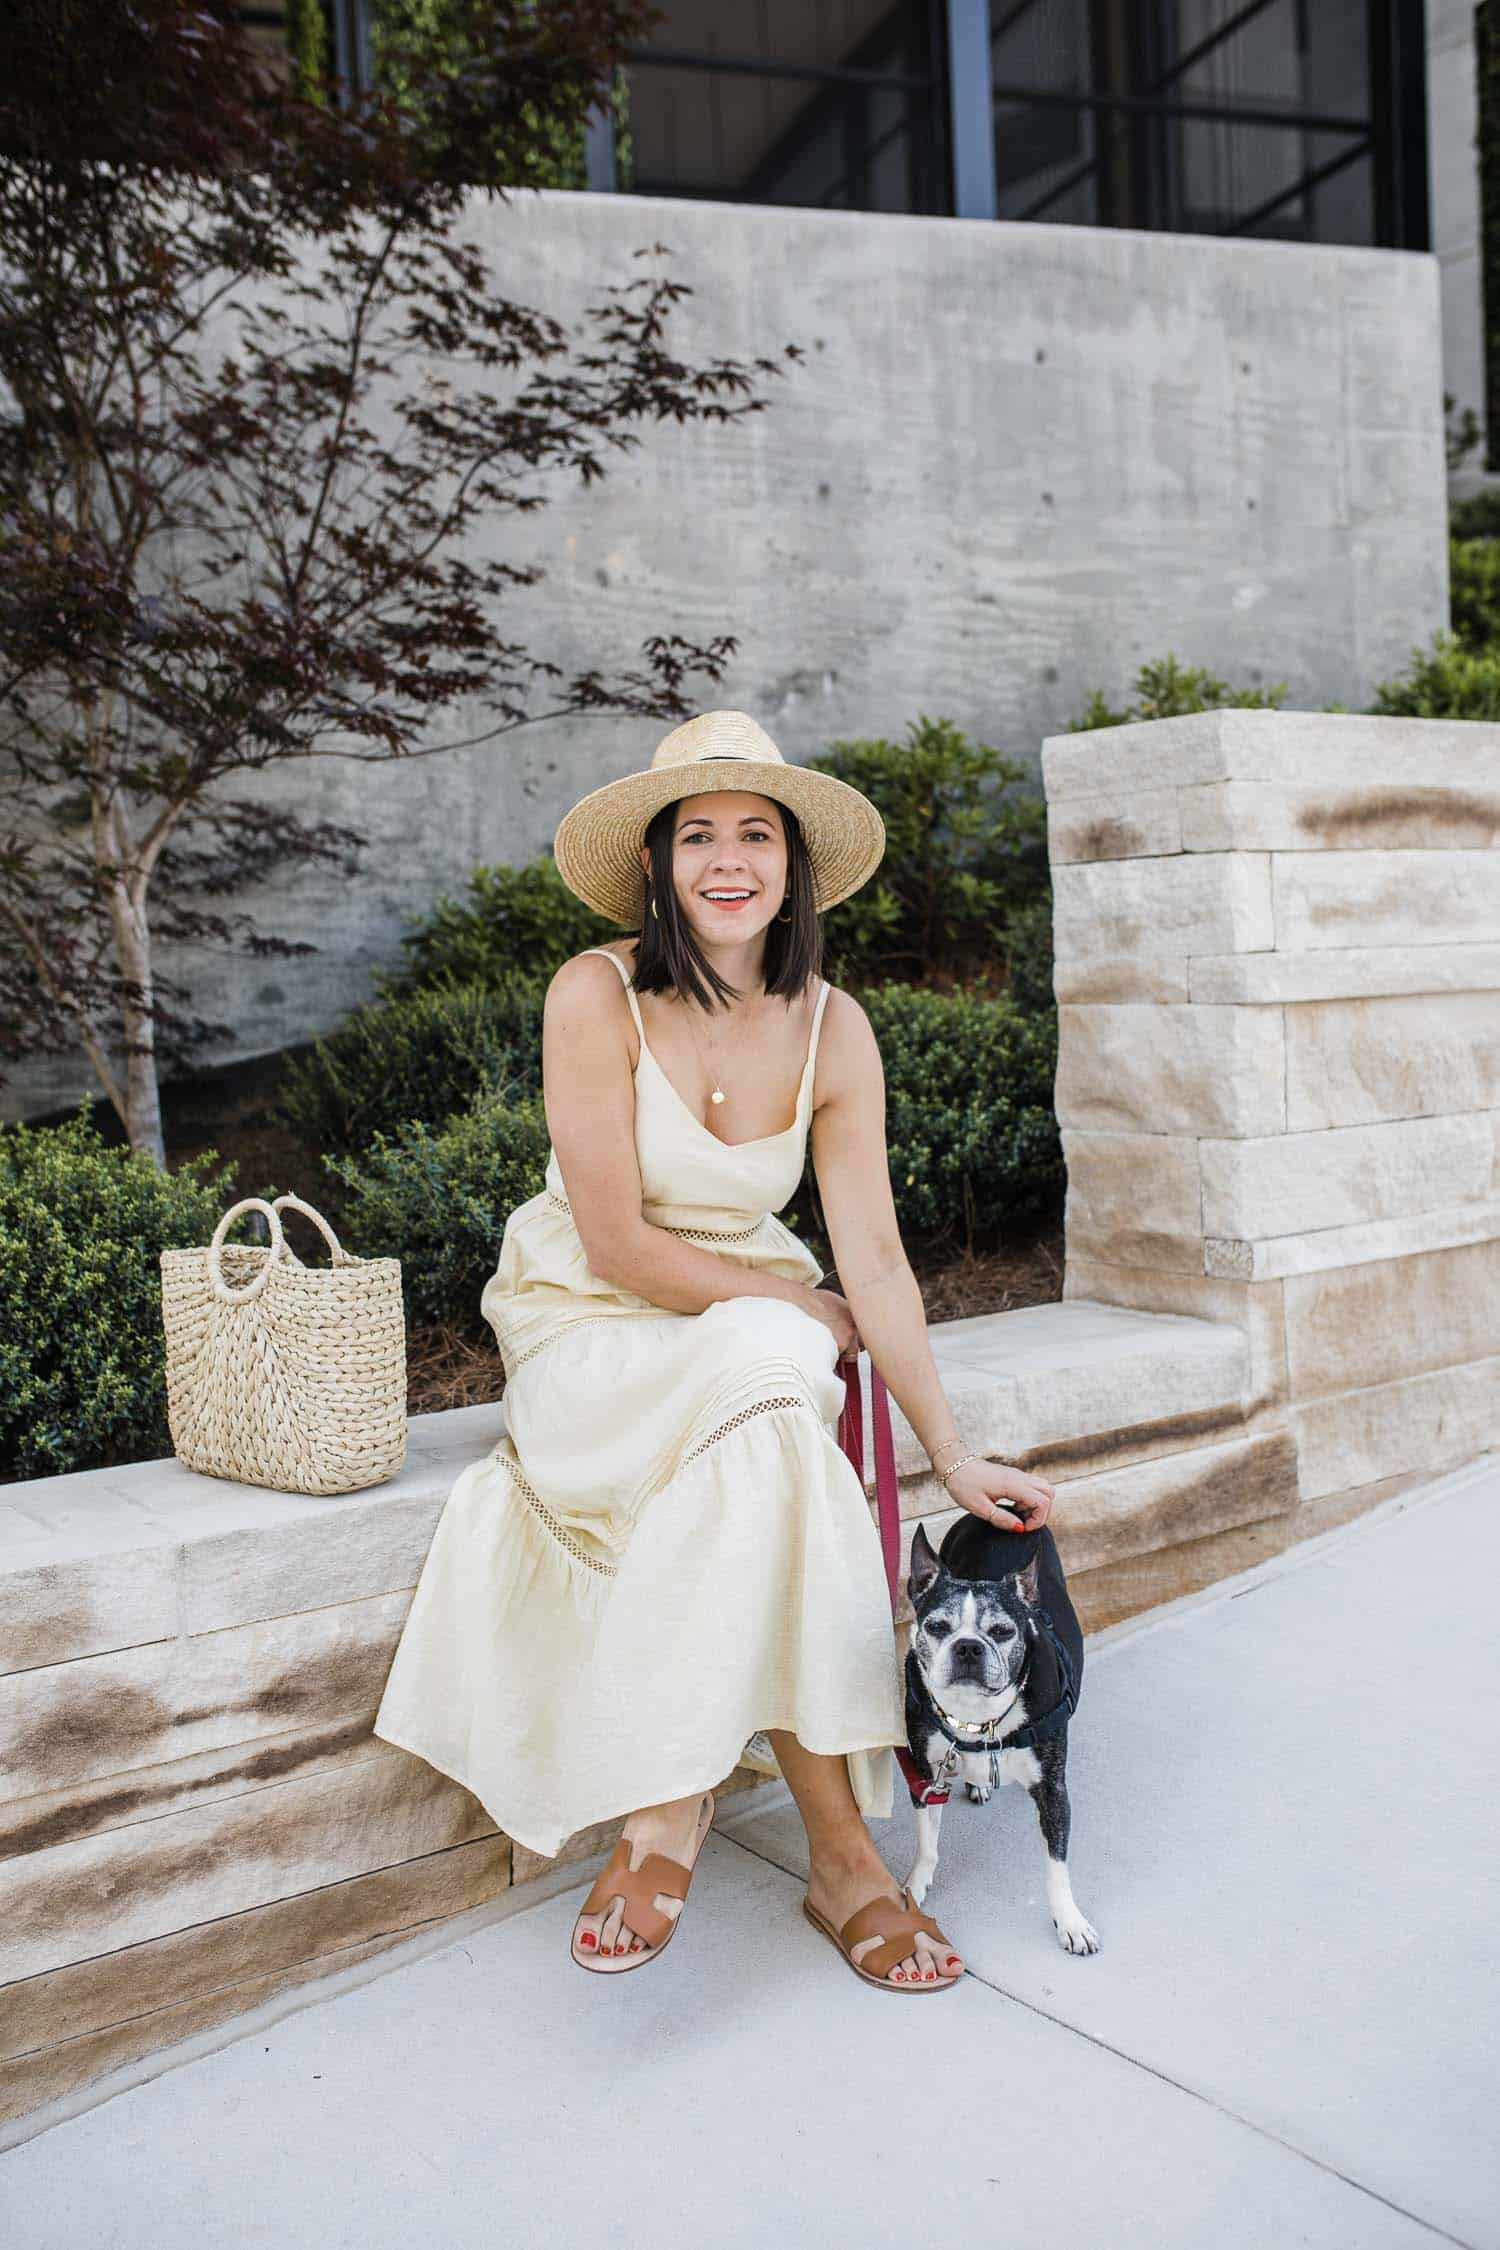 H&M Yellow Maxi Dress • Straw Hat • Steven Sandals •Hat Attack Straw Bag